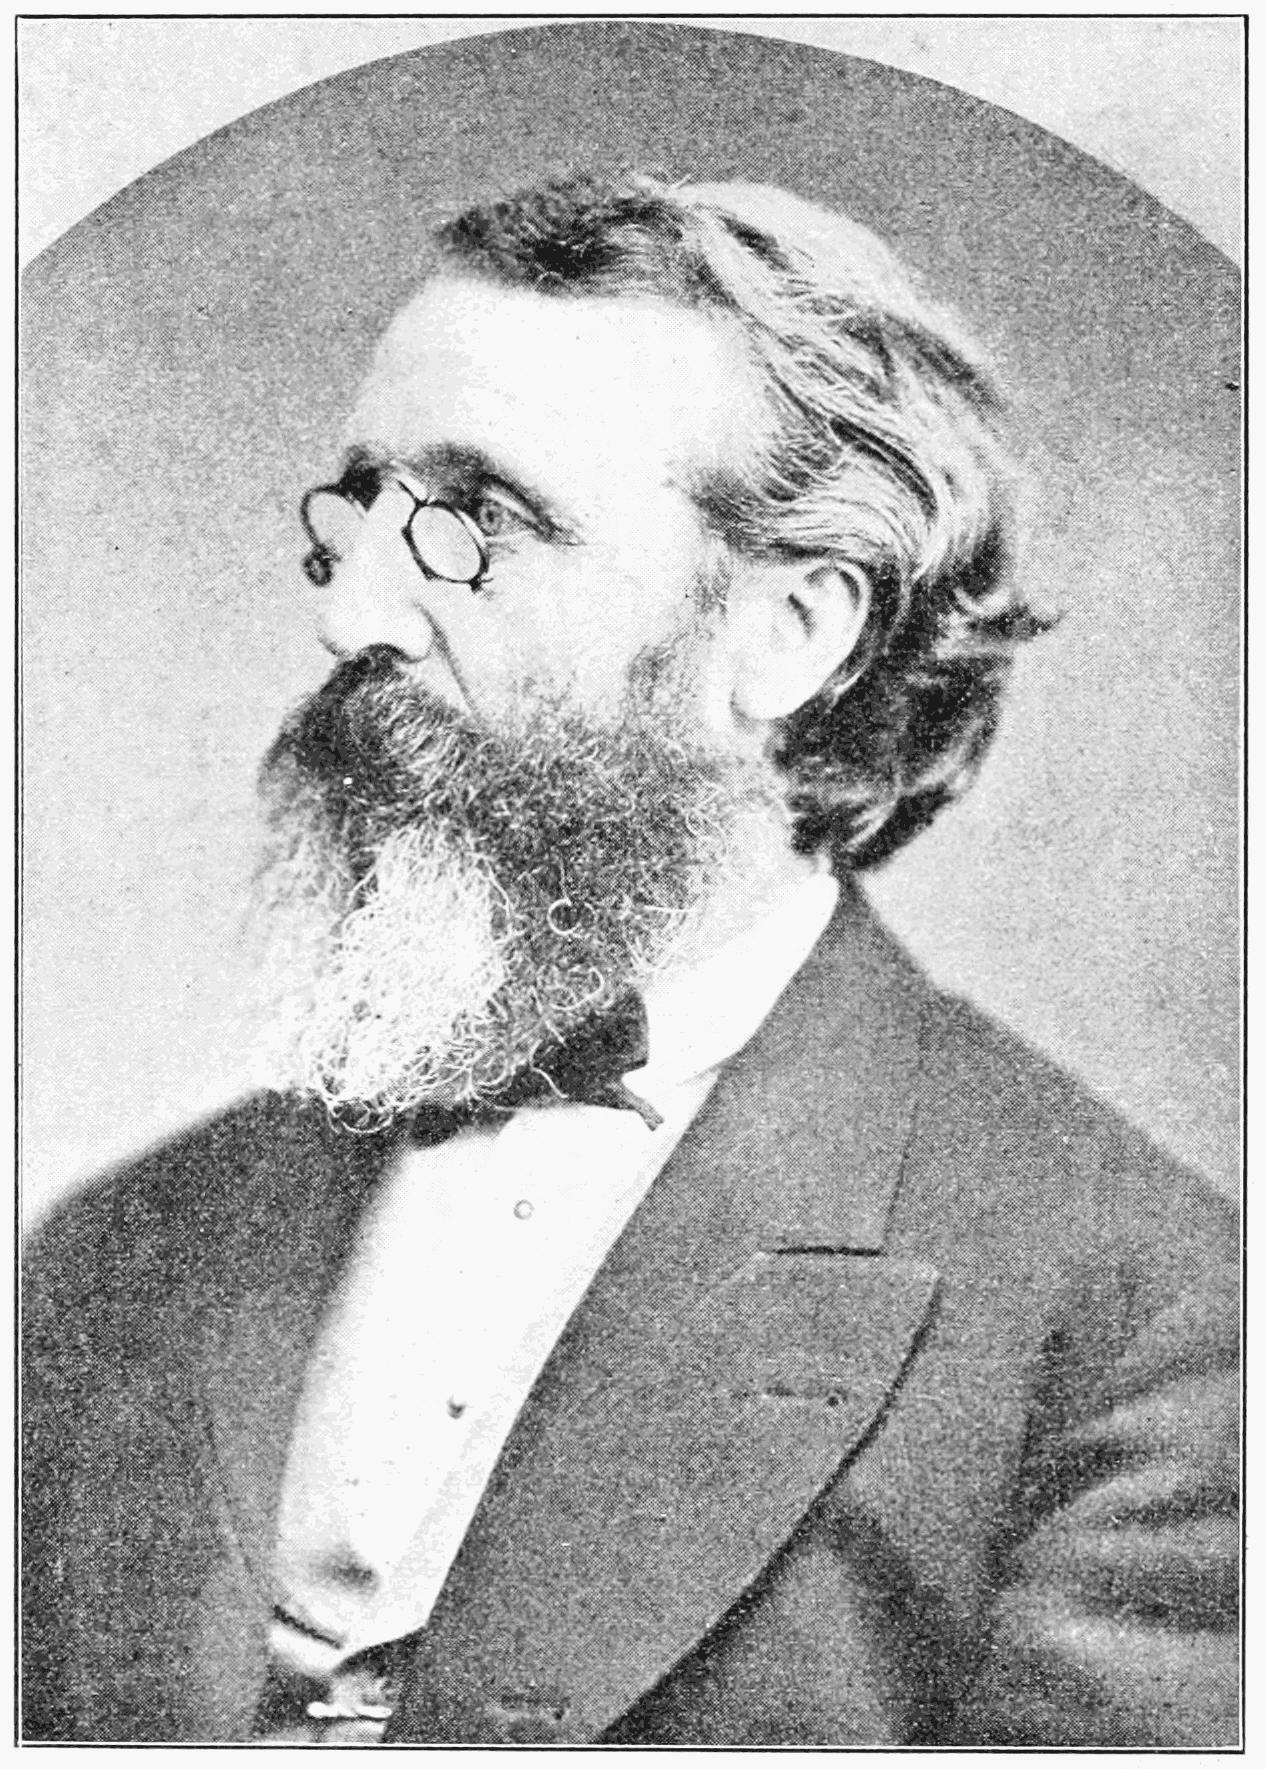 Image of John D. Runkle